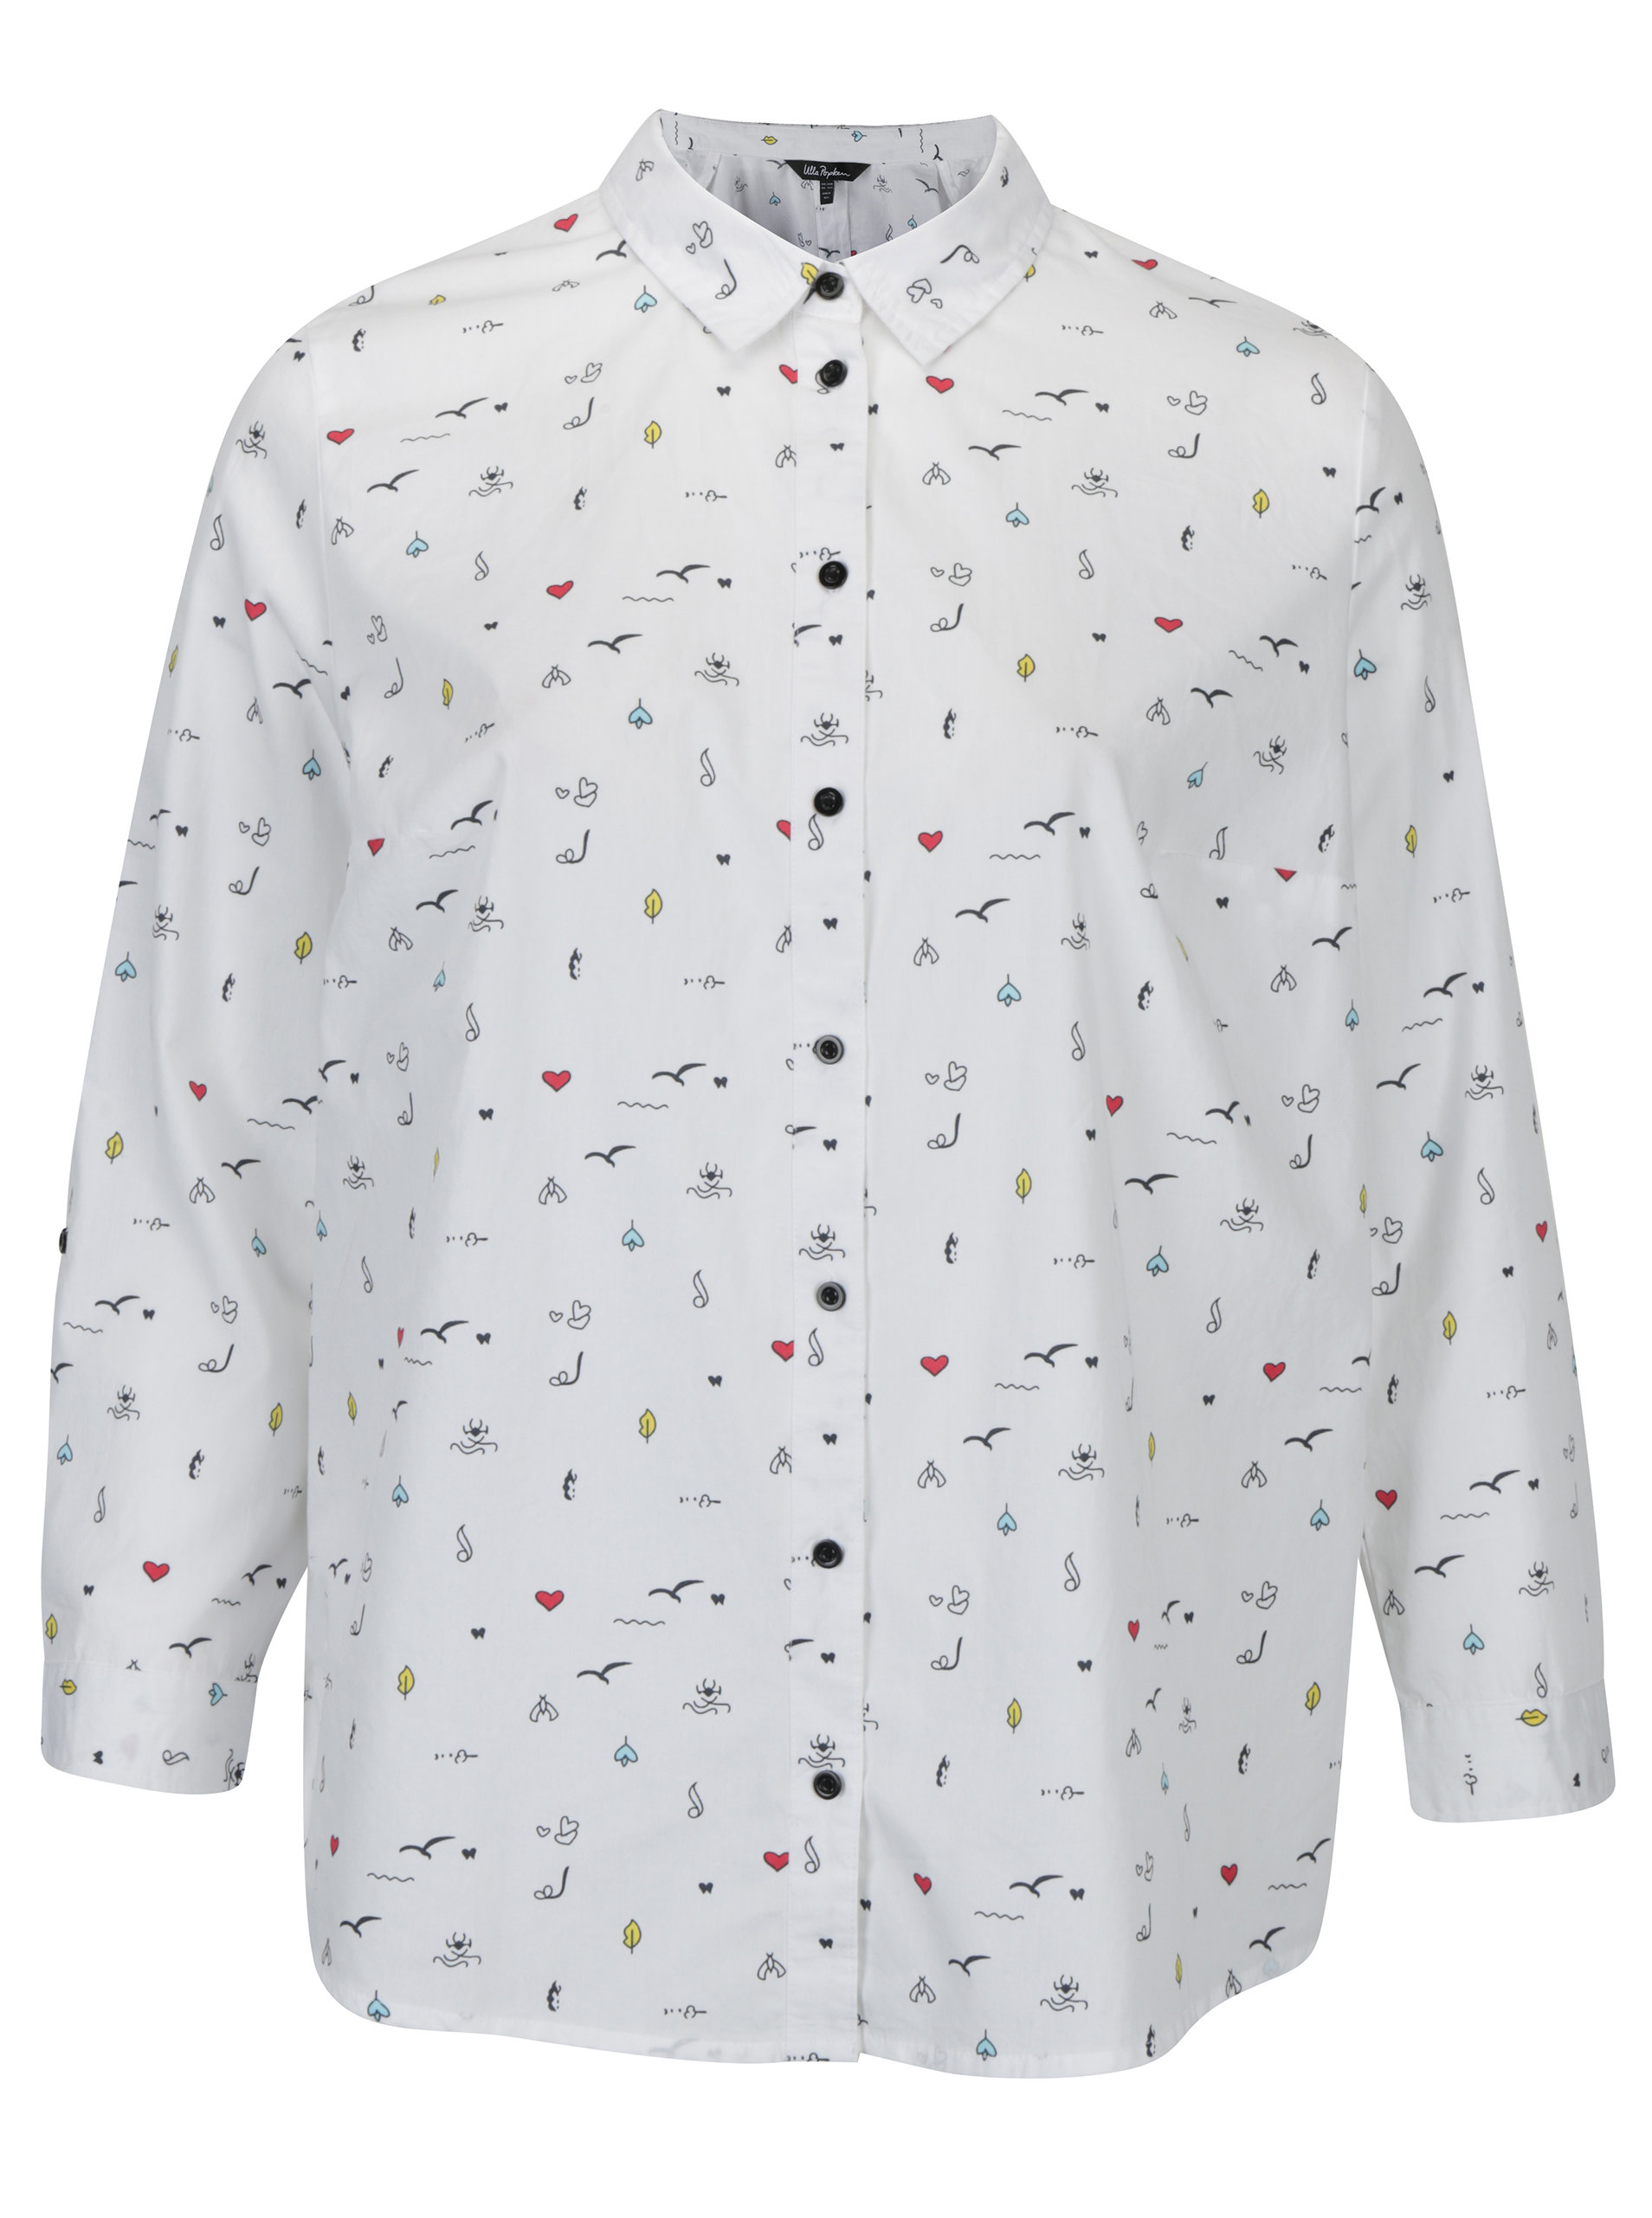 Bílá košile s drobným vzorem Ulla Popken ... 5f1b6cf2b9